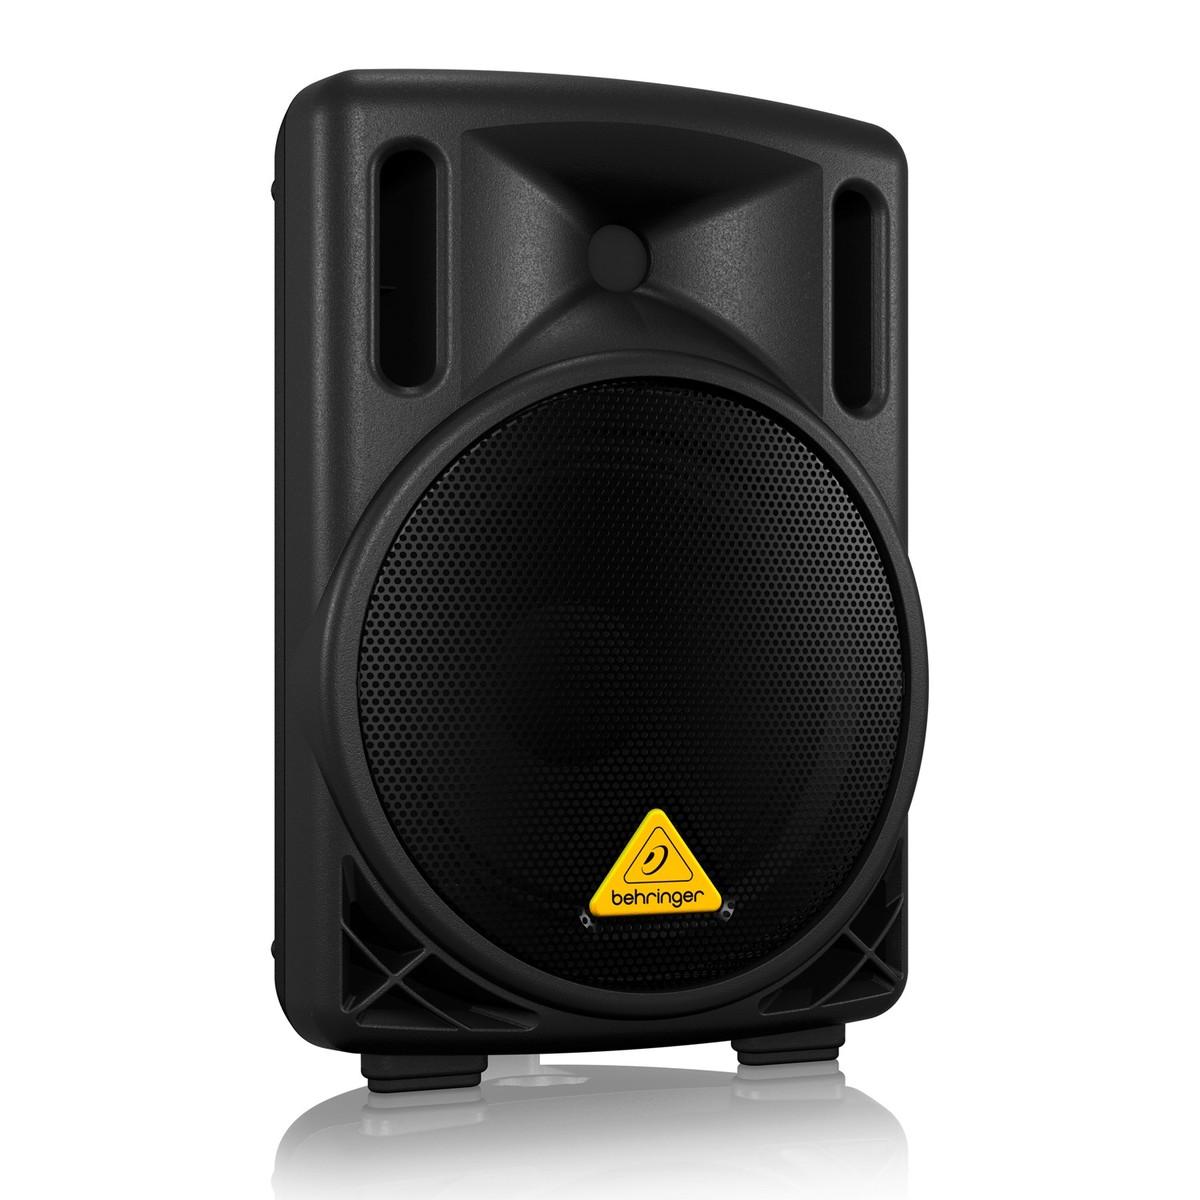 behringer b208d eurolive aktiver pa lautsprecher b ware gear4music. Black Bedroom Furniture Sets. Home Design Ideas